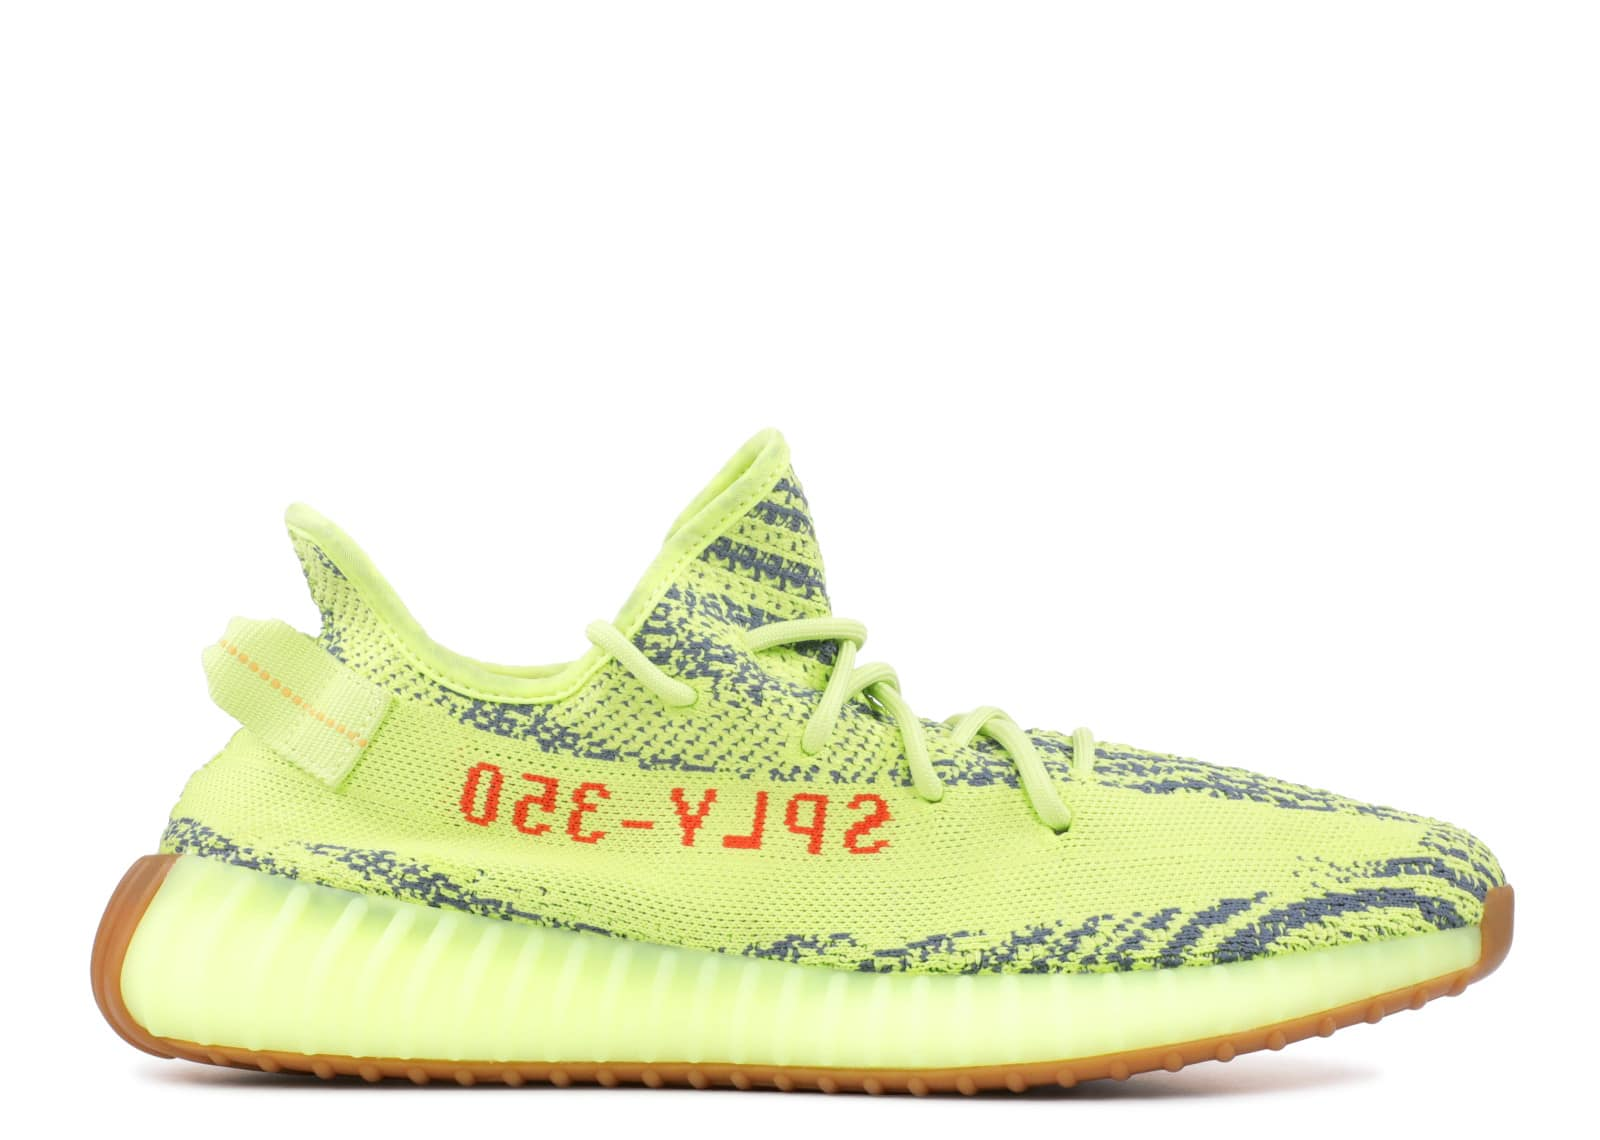 Adidas Yeezy 350 v2 Semi-Frozen Yellow